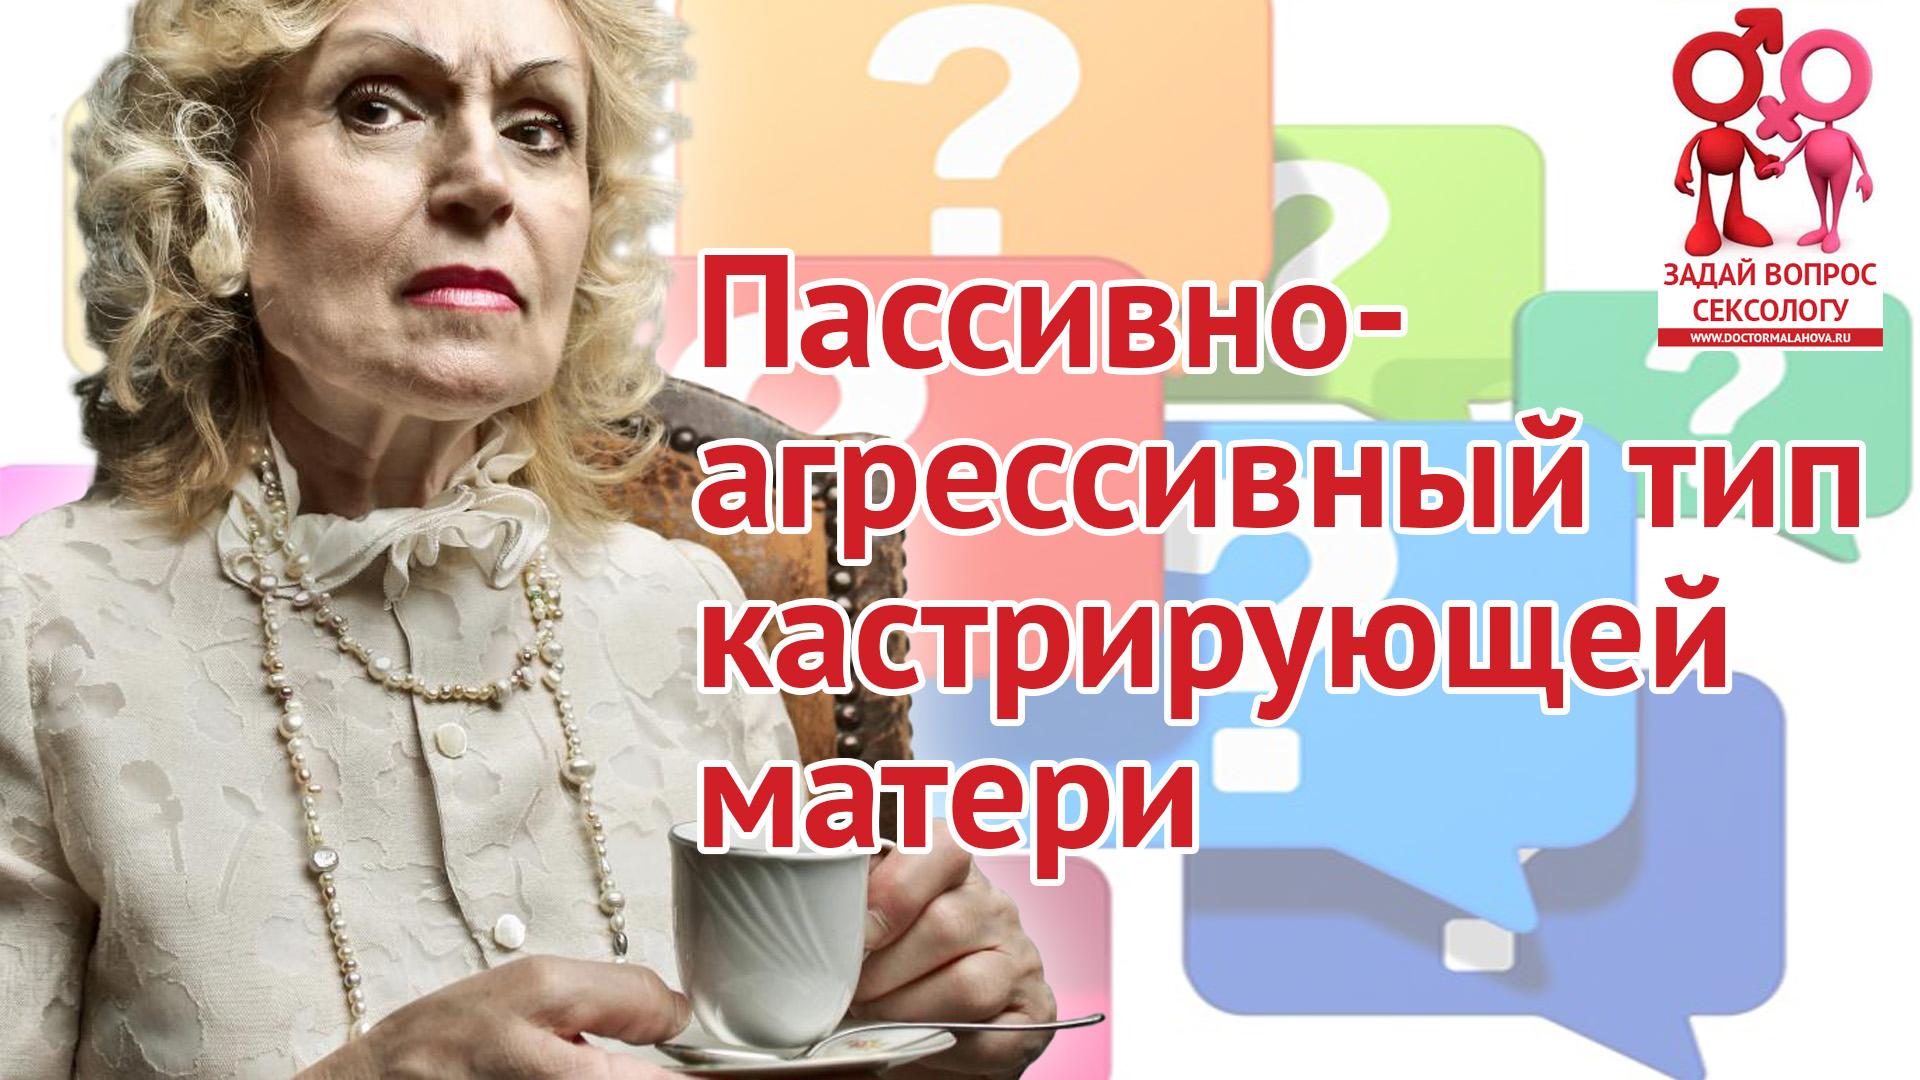 Кастрация_часть3